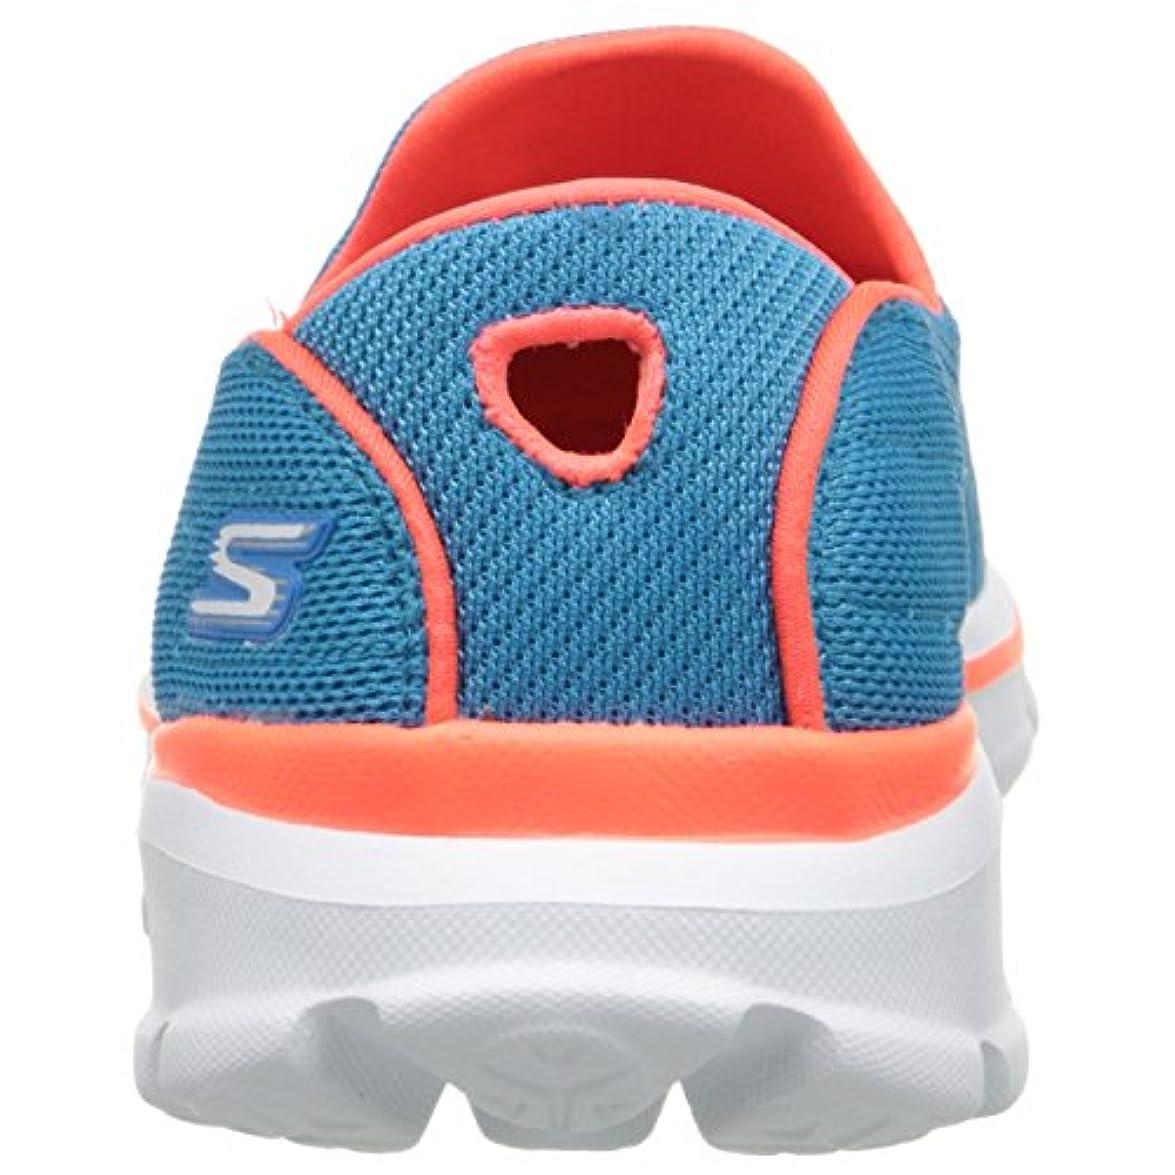 Skechers Go Walk 3 nbsp;– nbsp;strike Sneakers Da Donna